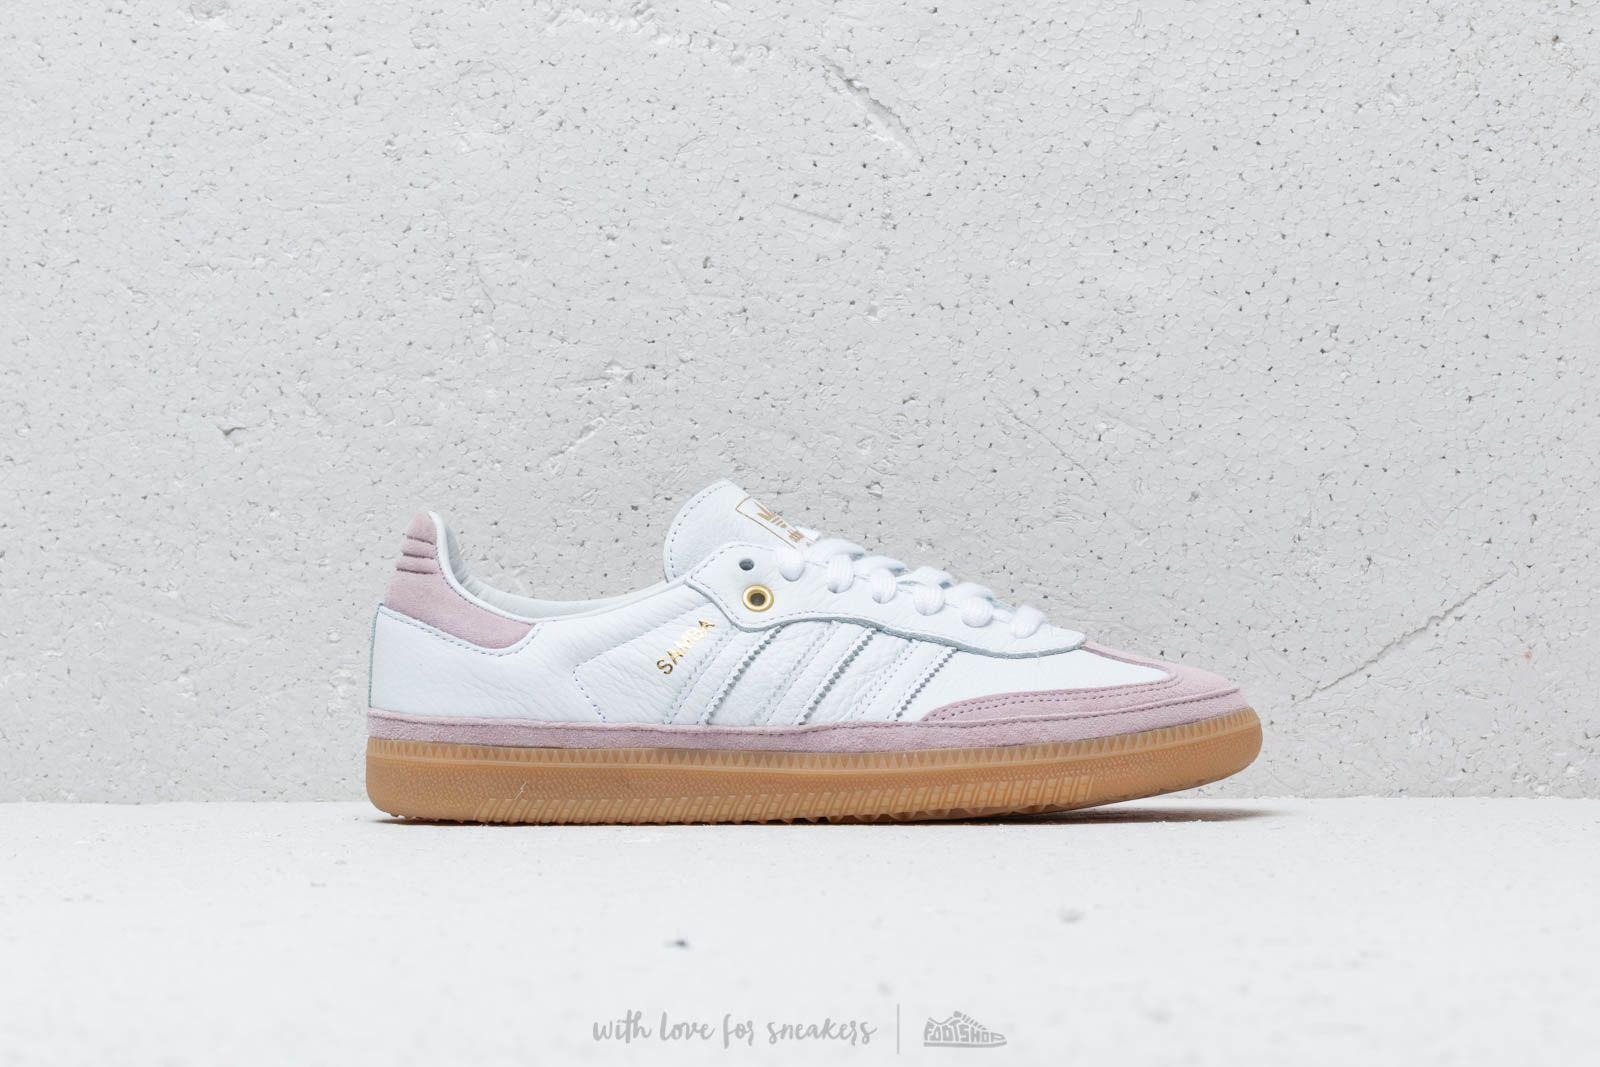 adidas Samba OG W Relay Ftw White/ Ftw White/ Sofvis | Footshop